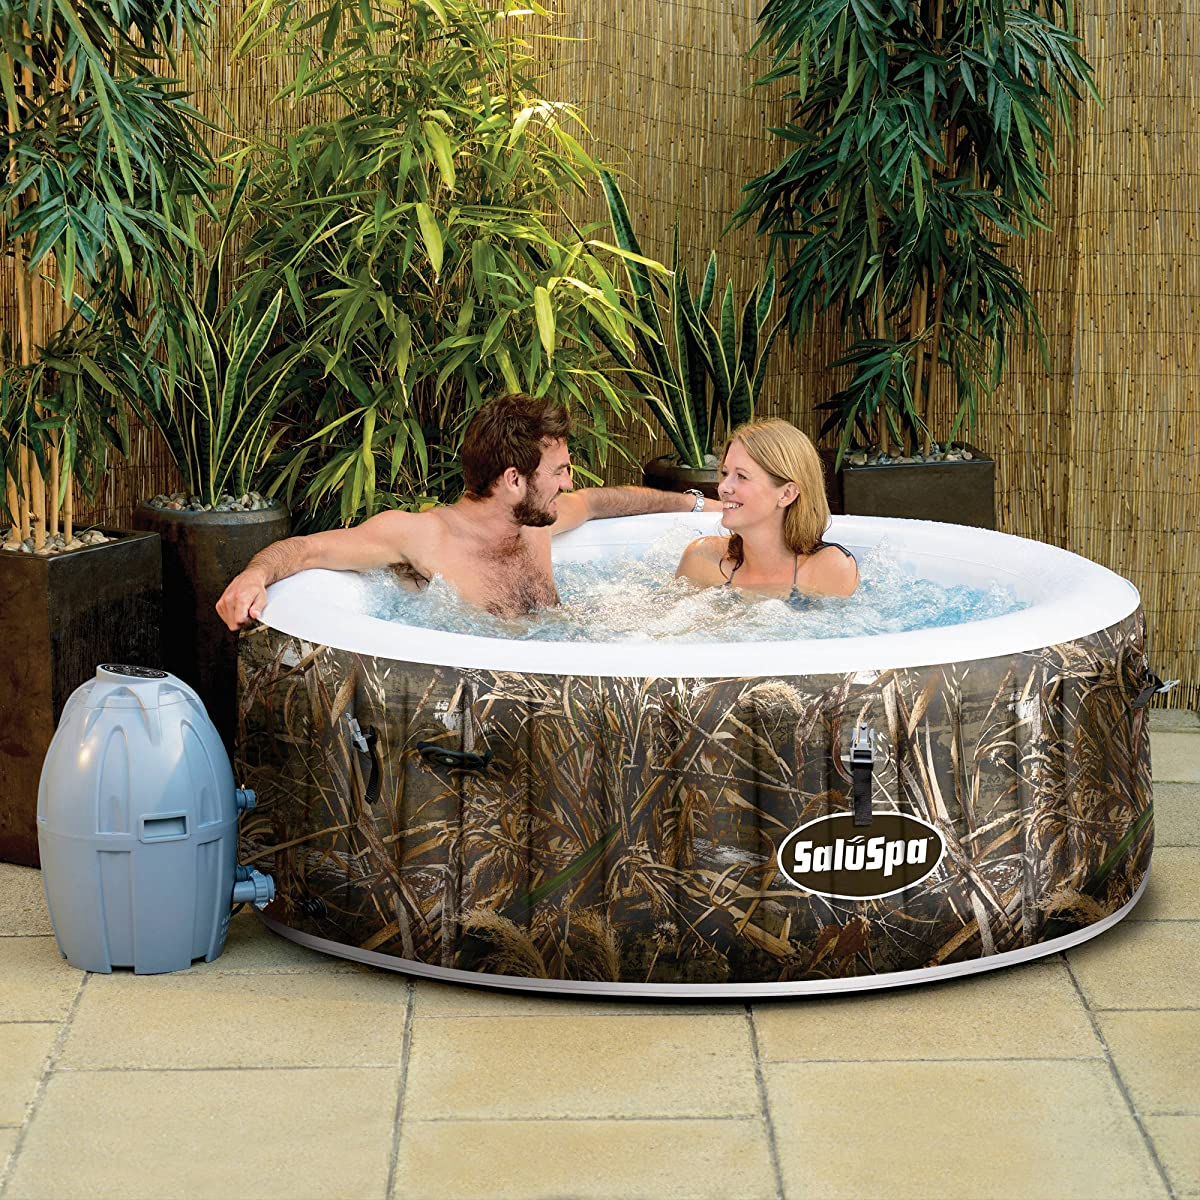 SaluSpa Realtree MAX-5 AirJet 4 Person Portable Inflatable Hot Tub Spa